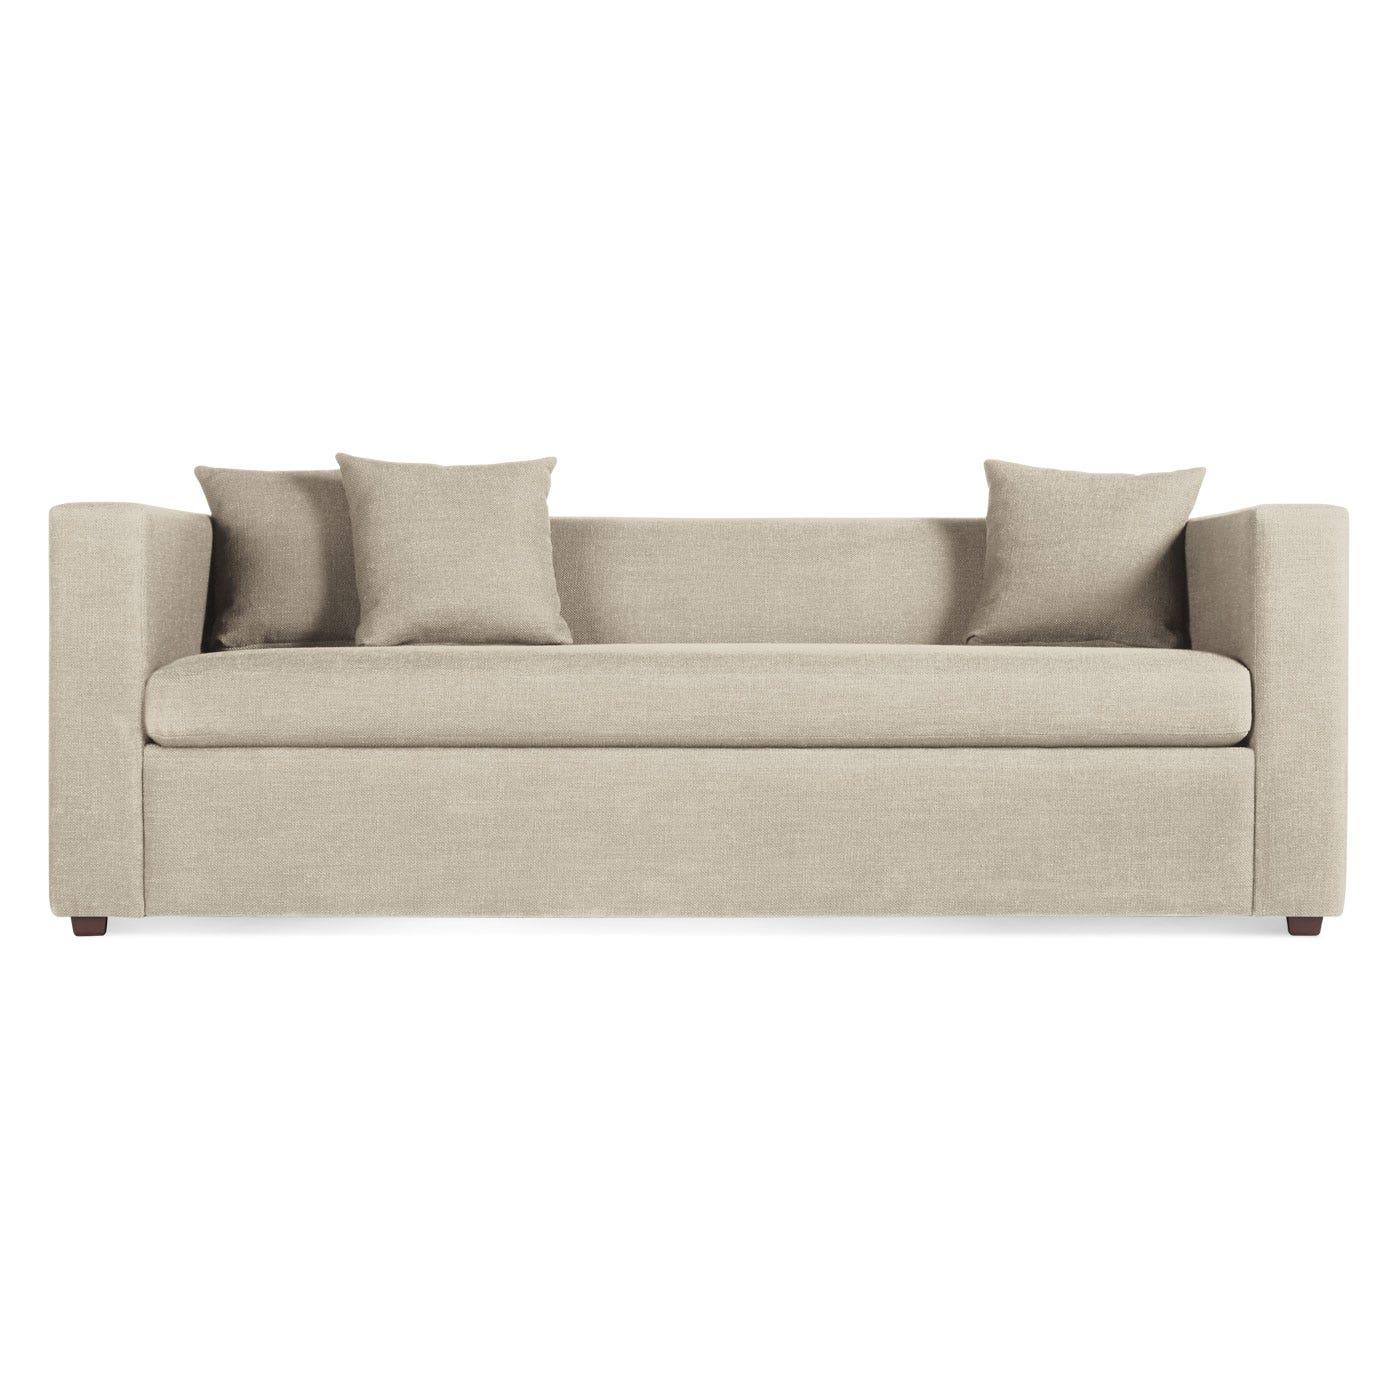 Mono Modern Sleeper Sofa Single Cushion Sofa